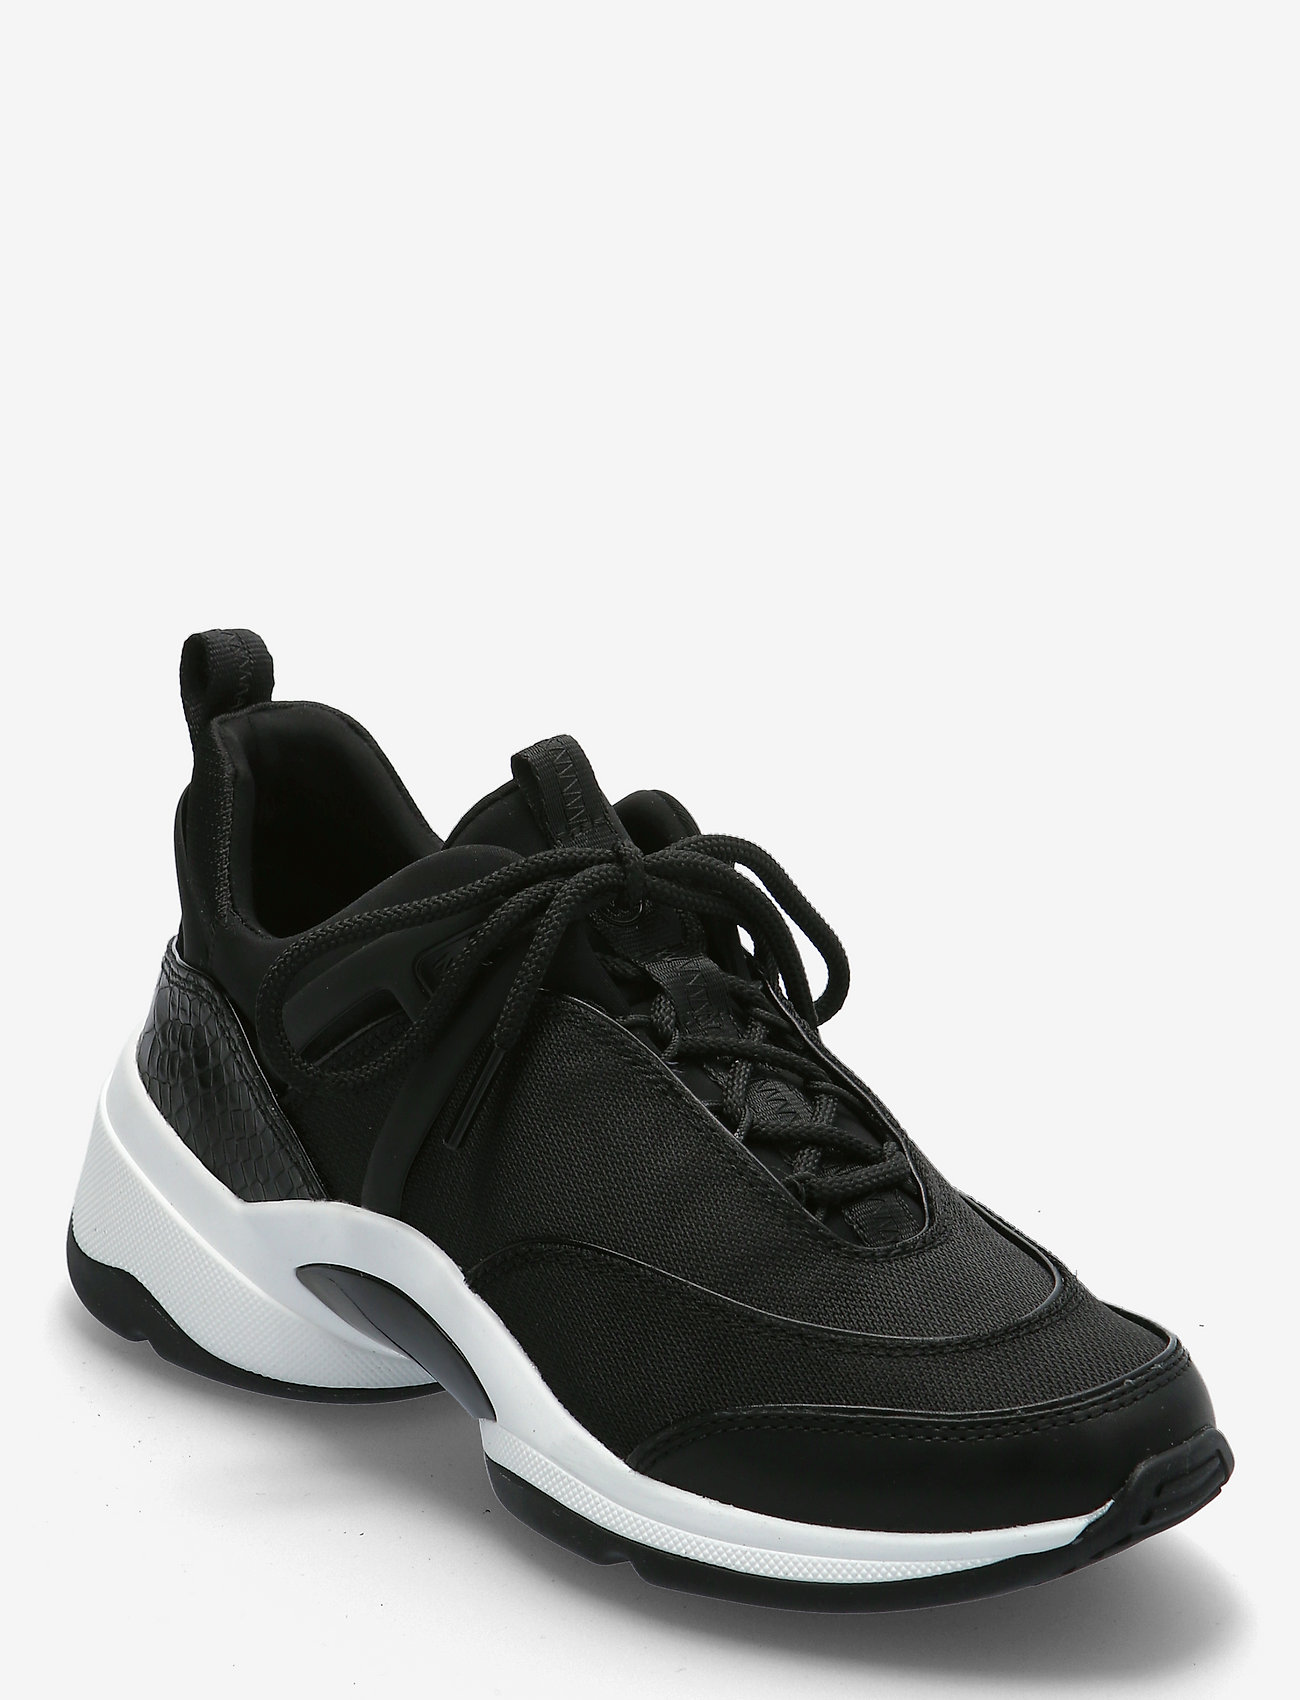 Michael Kors - SPARKS TRAINER - chunky sneakers - black - 0